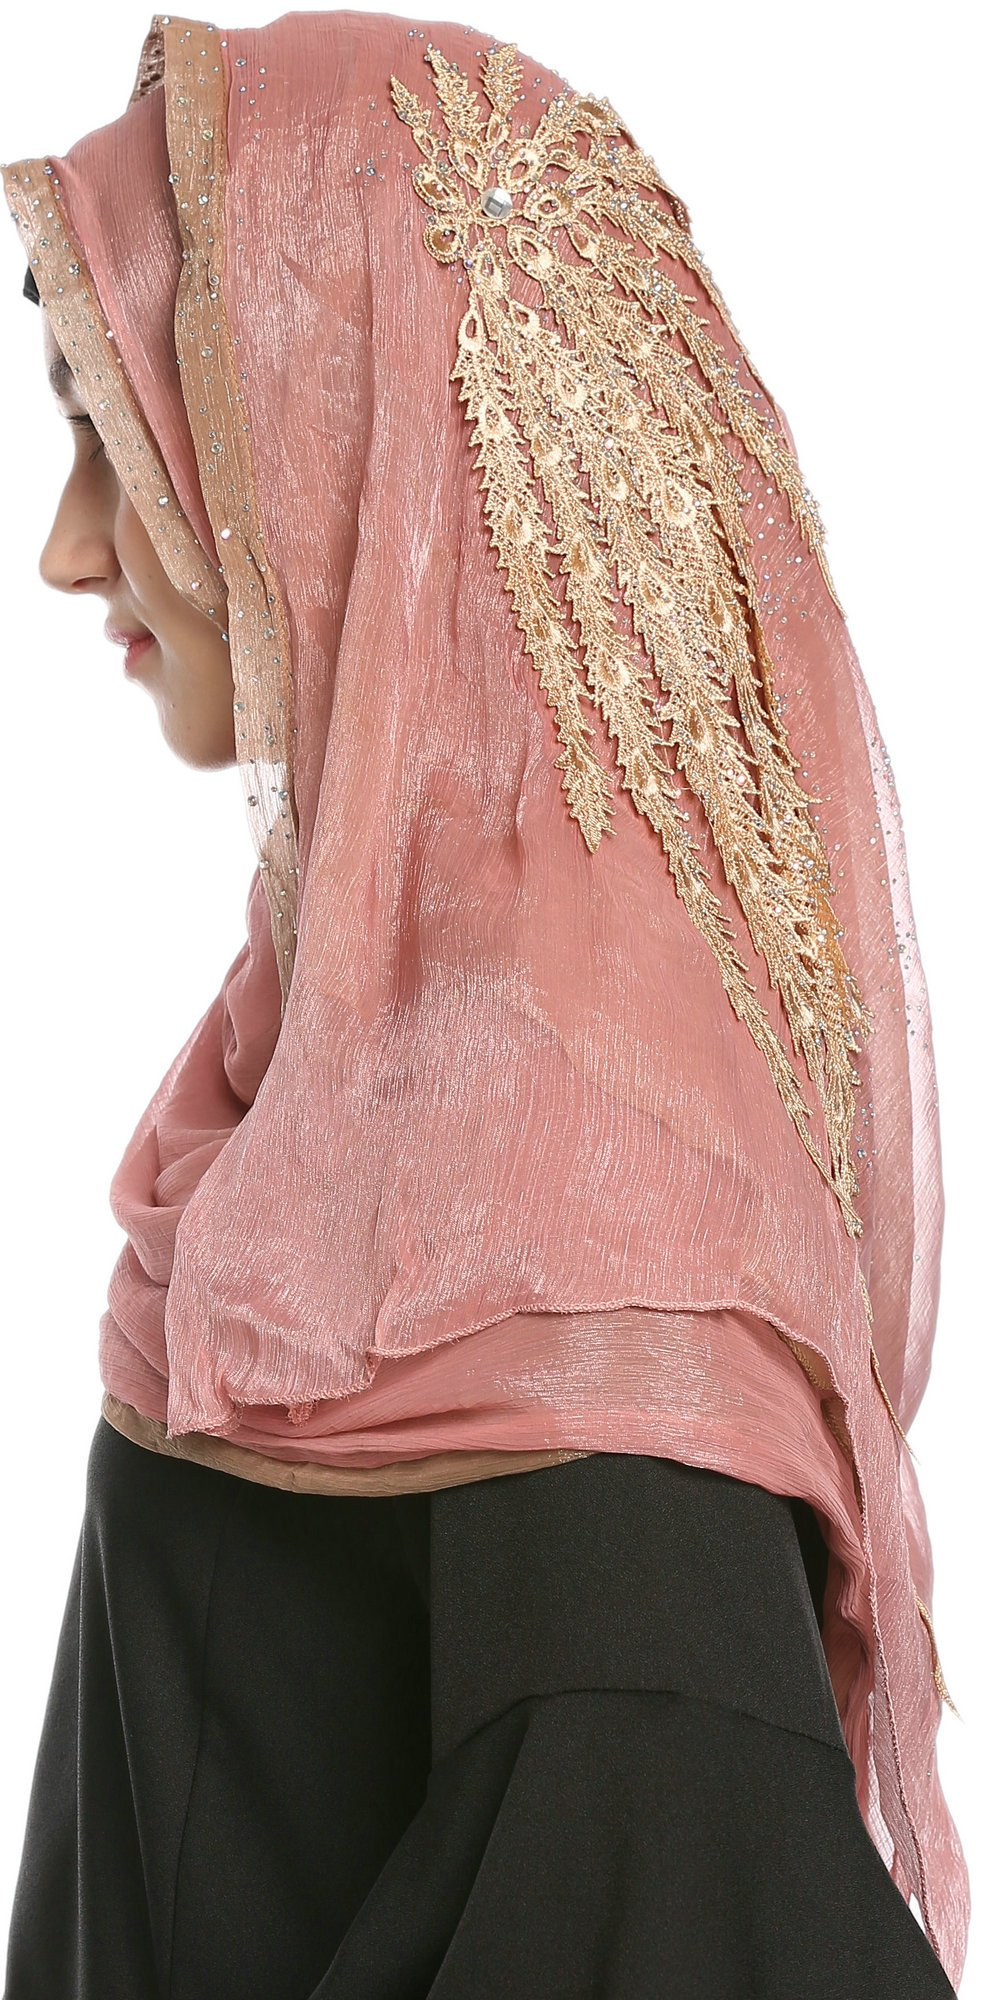 Ababalaya Lace Decorated Wedding Hijab Islamic Hijab,Color3 by Ababalaya (Image #2)